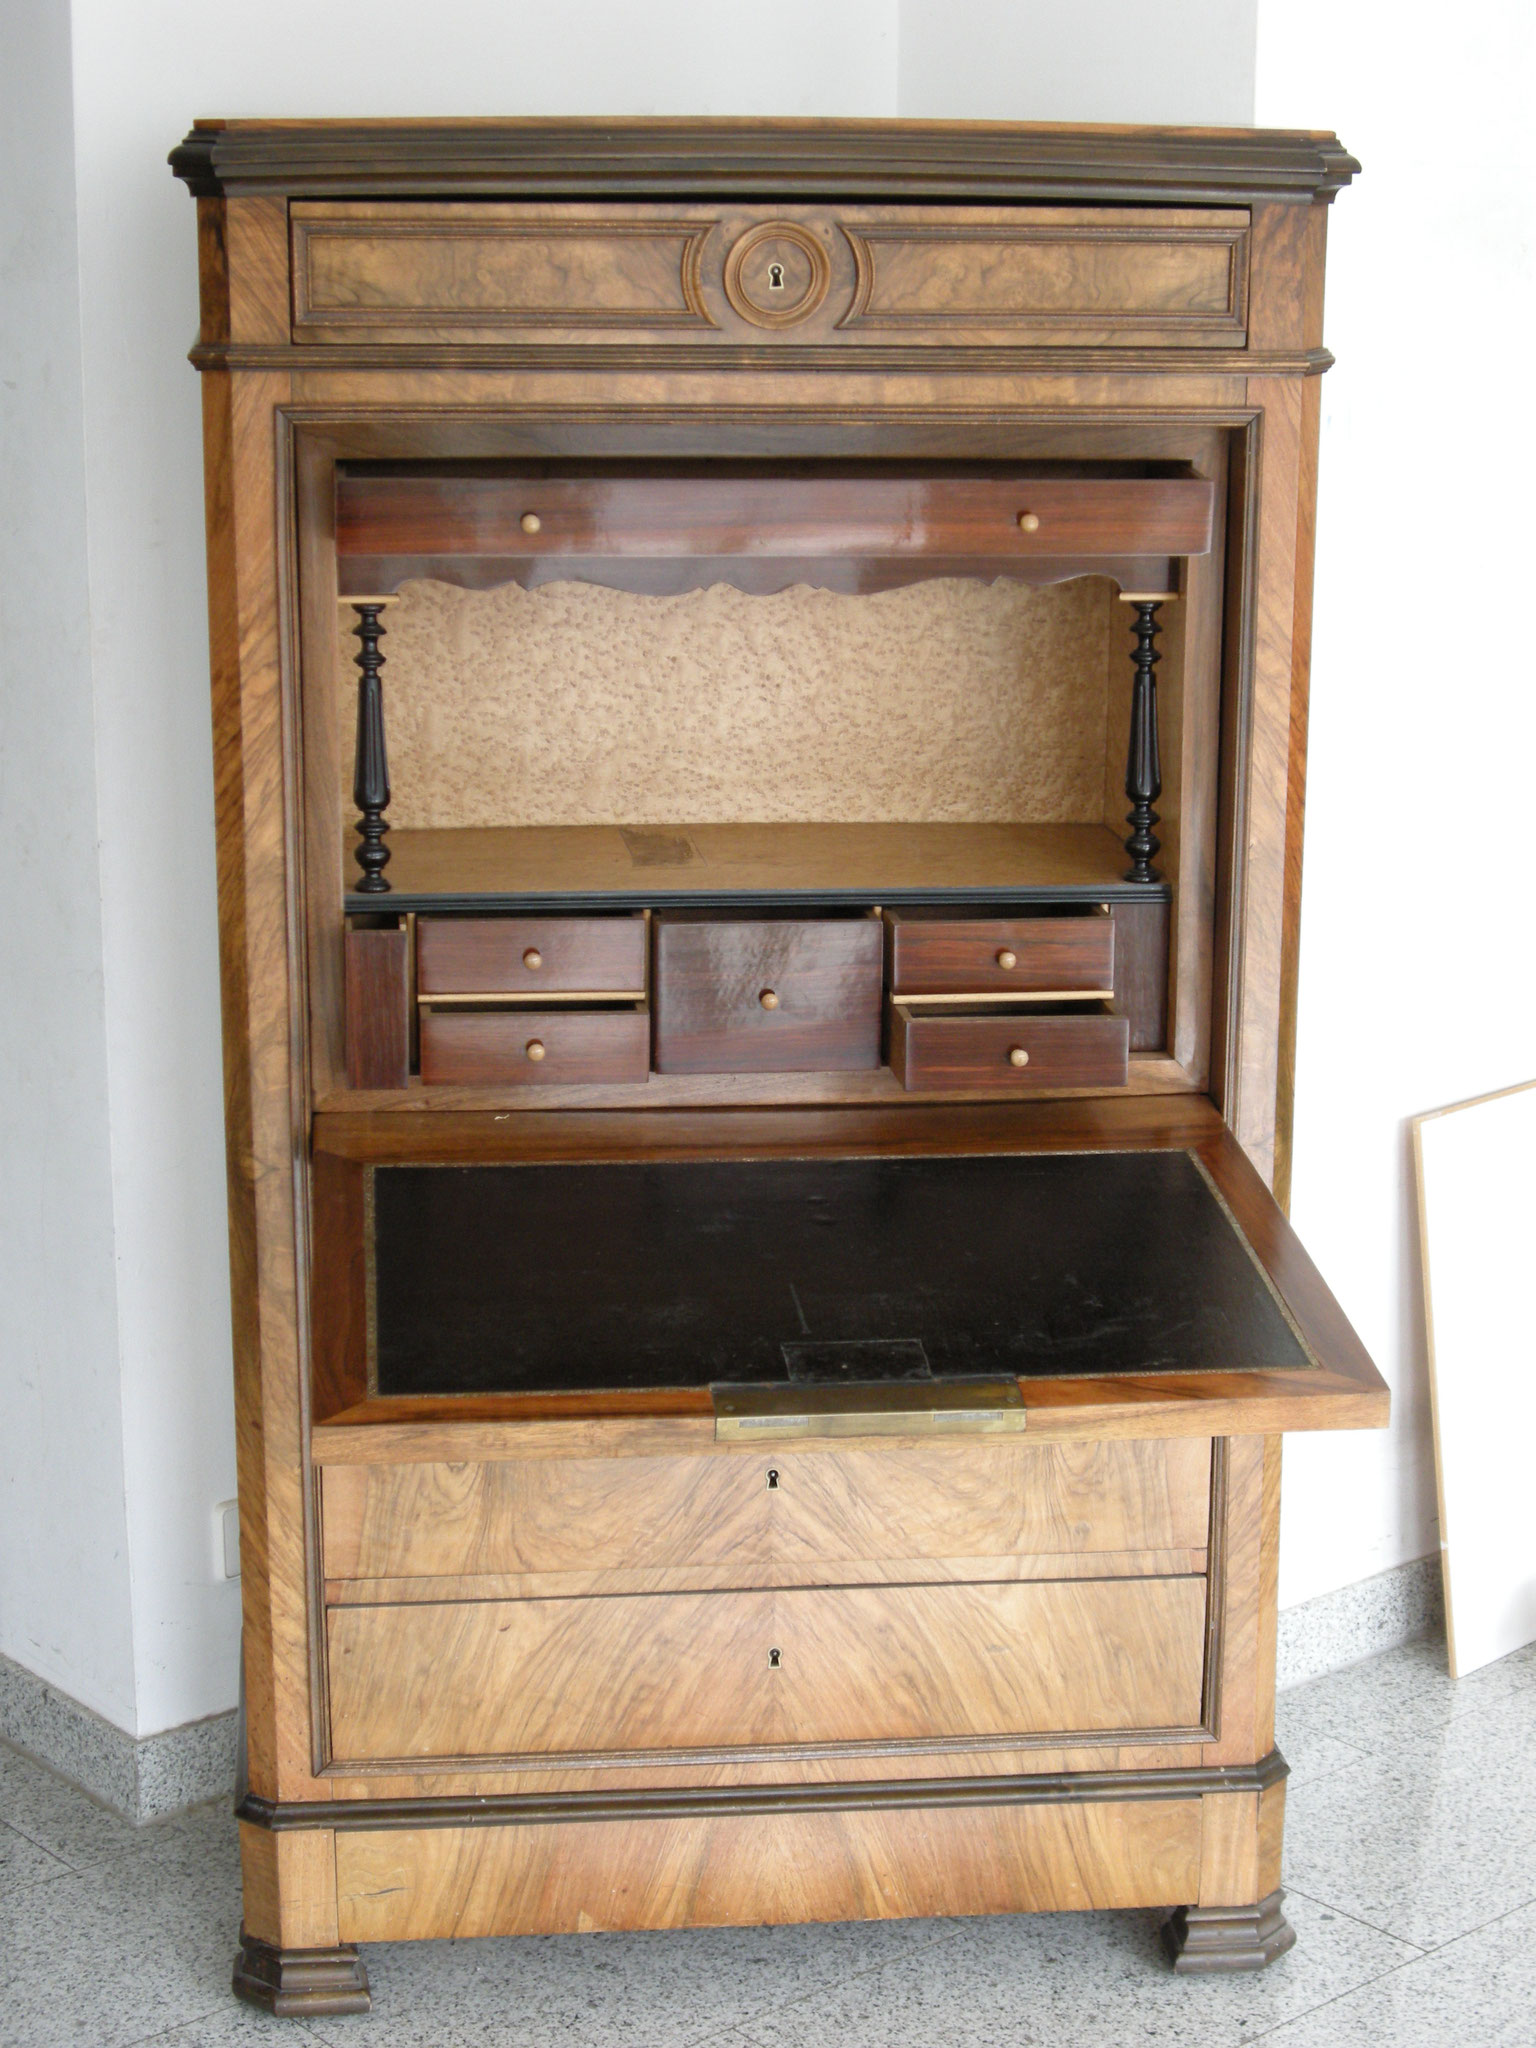 restaurierung mo woods webseite. Black Bedroom Furniture Sets. Home Design Ideas